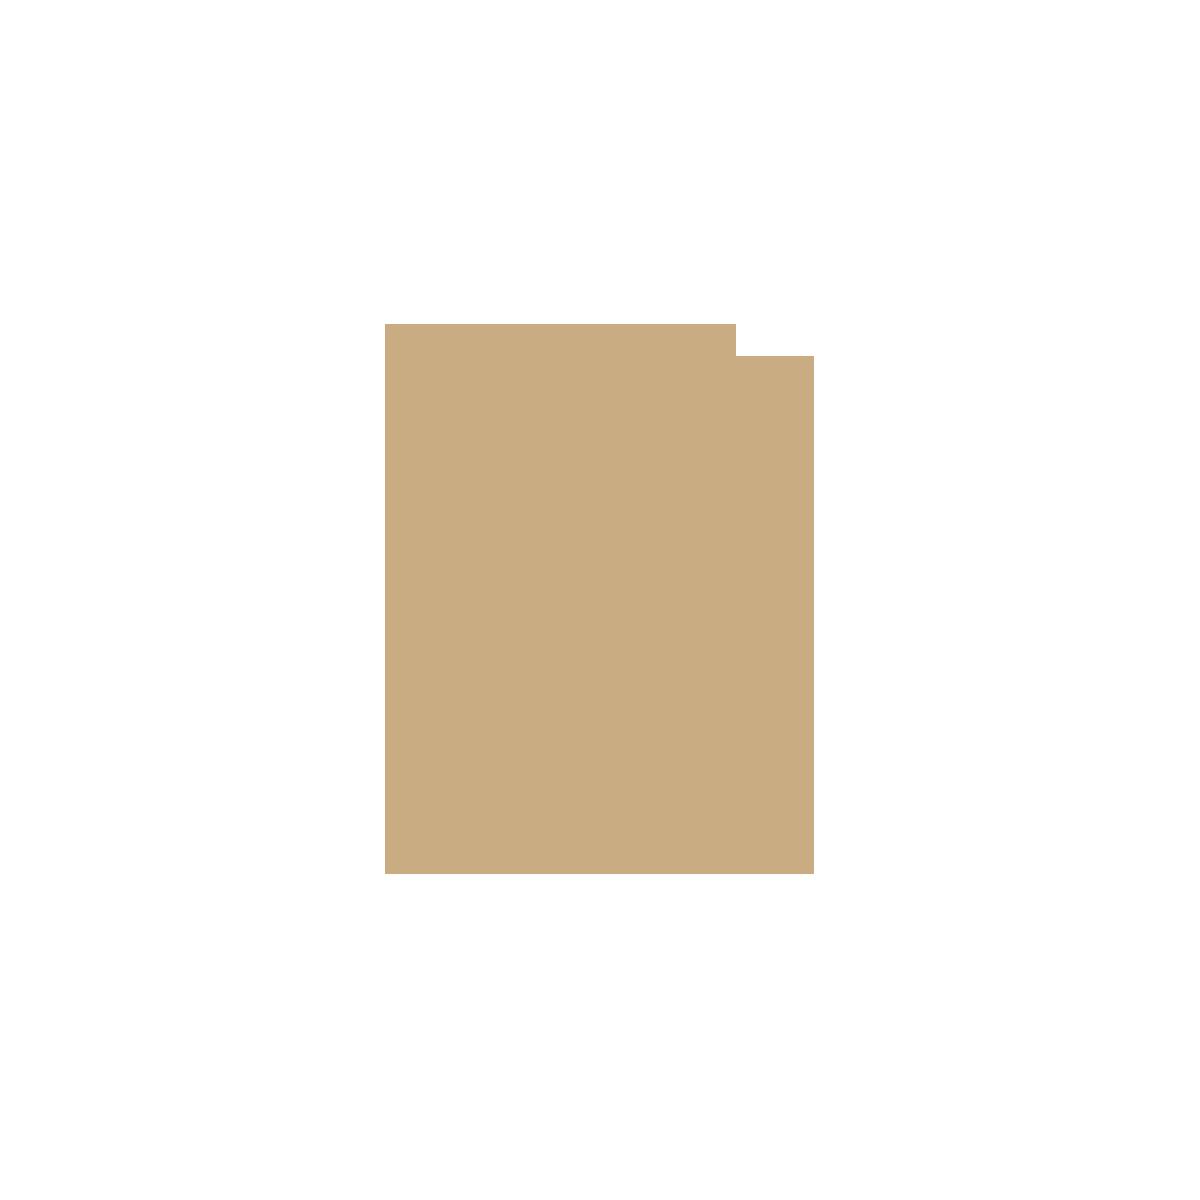 Ritual_Logos_Mark_Square.png